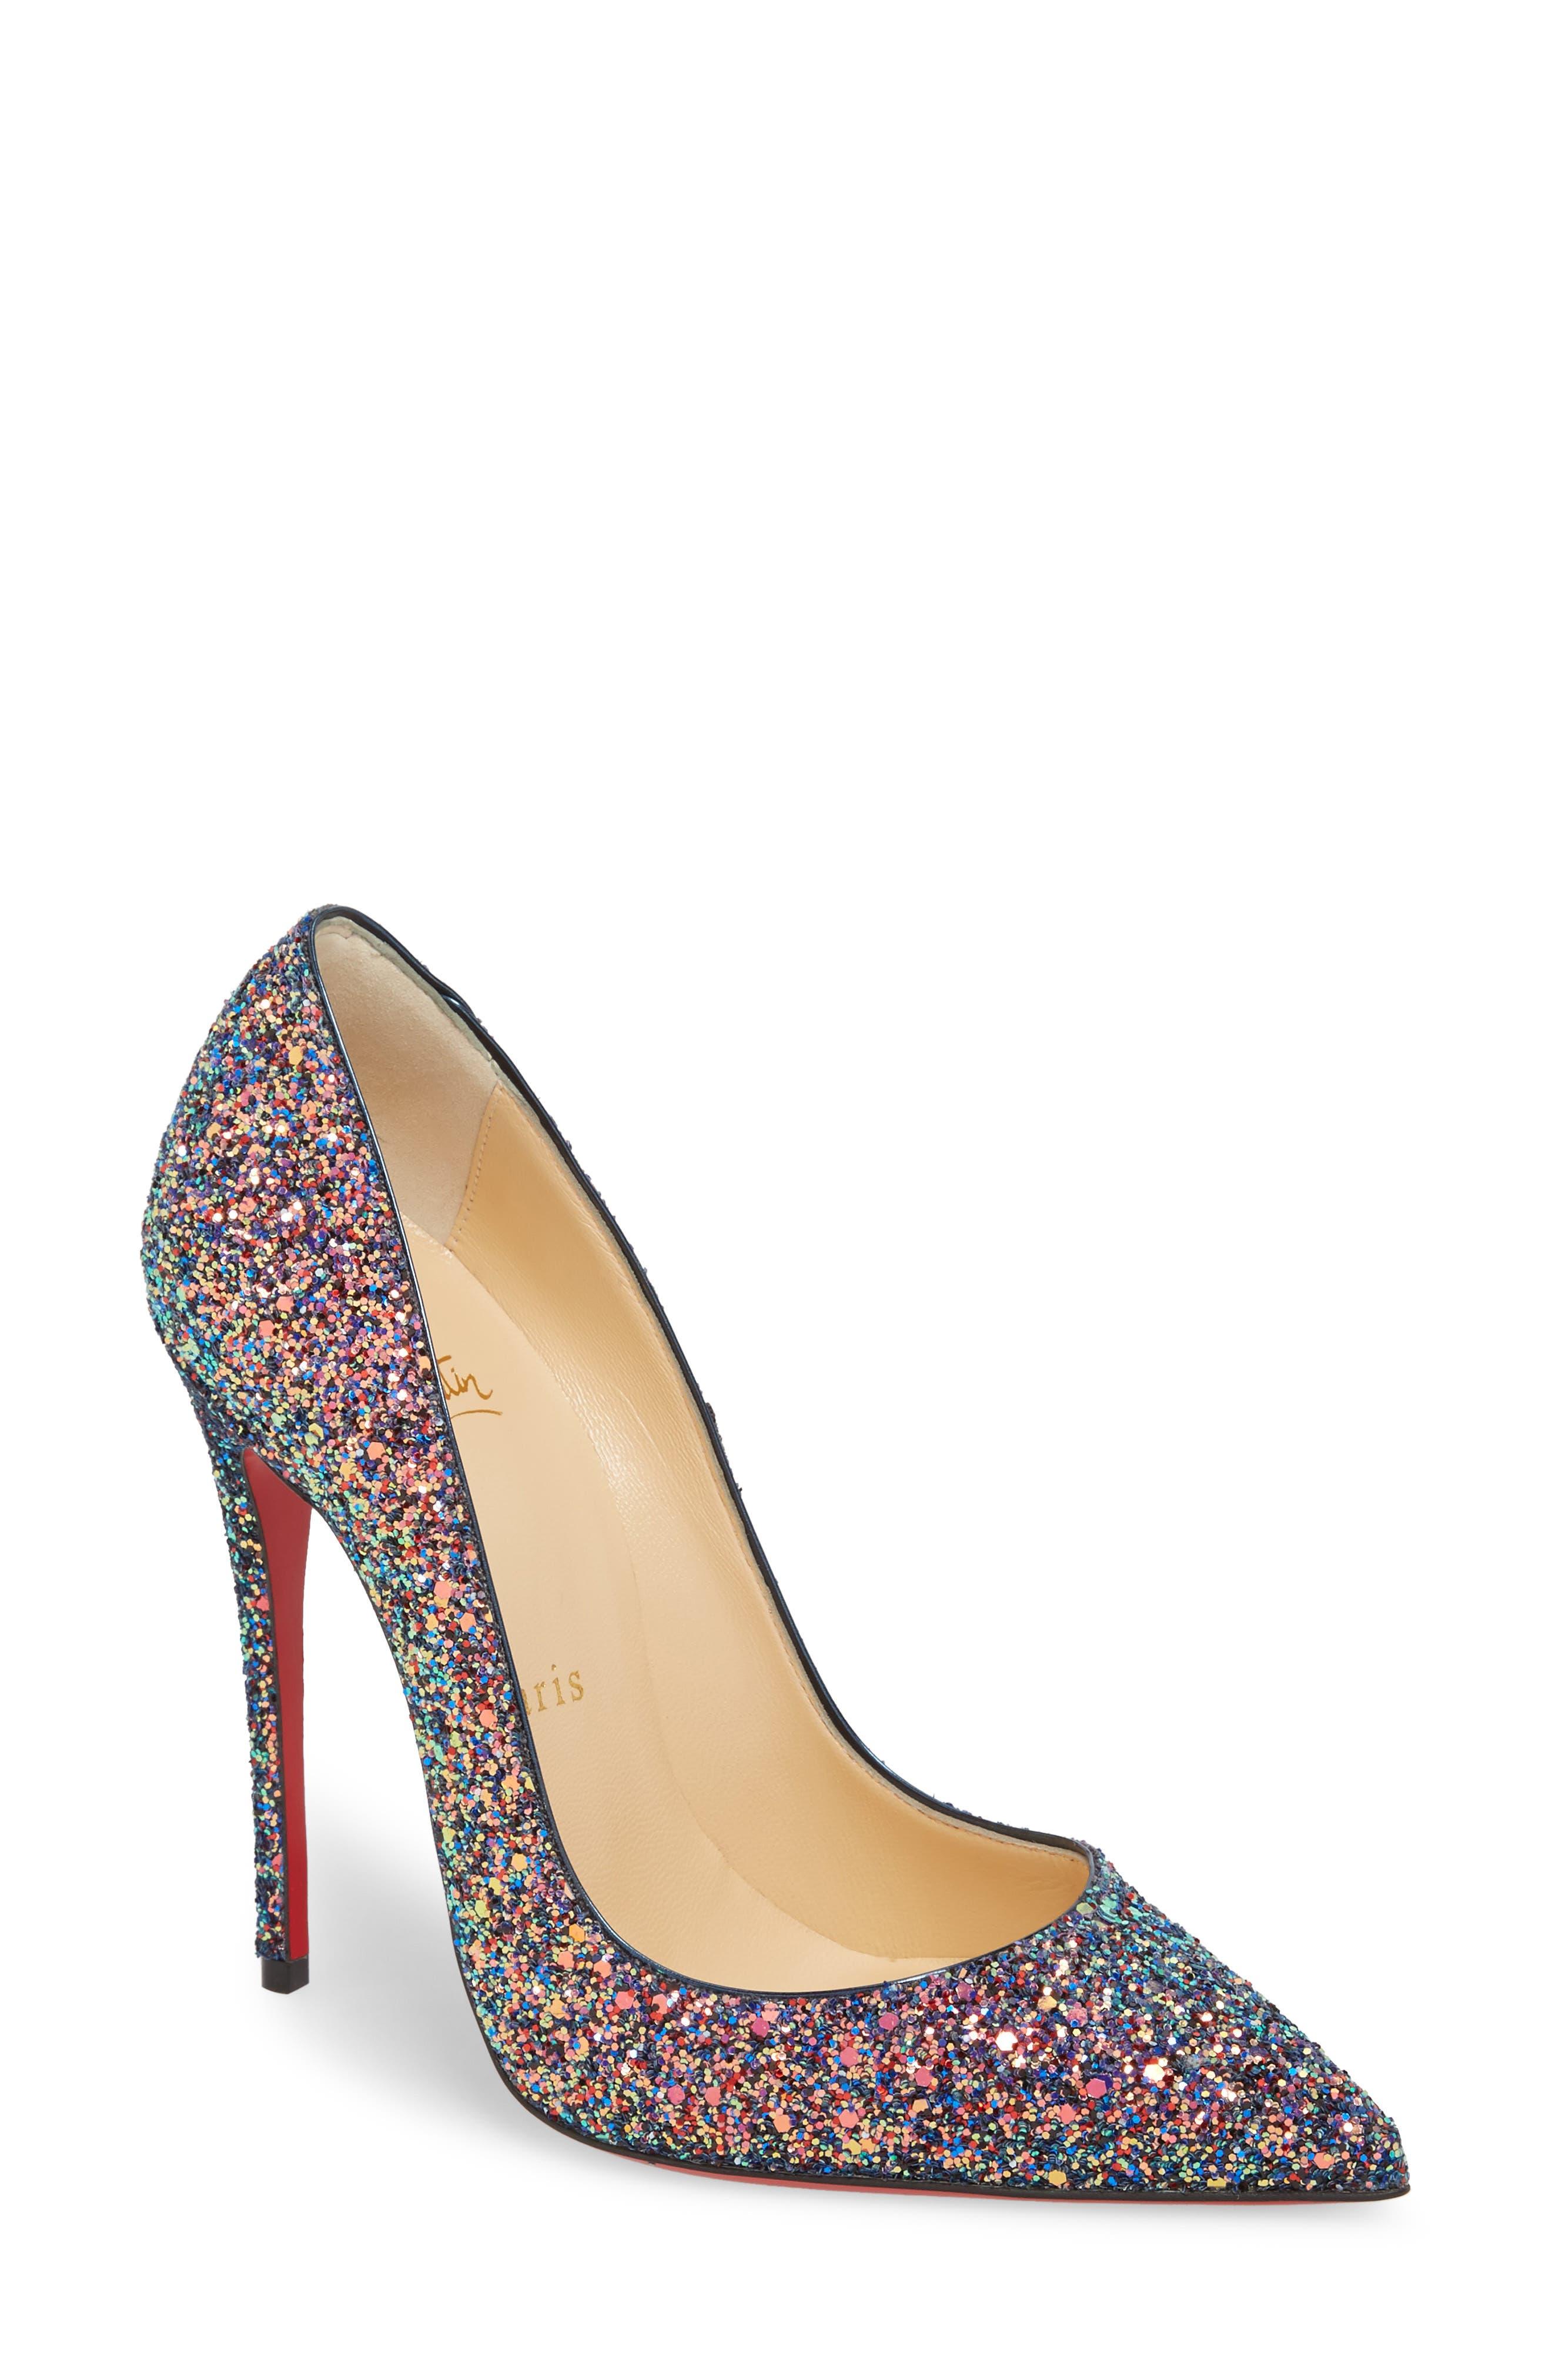 christian louboutin shoes at bloomingdales